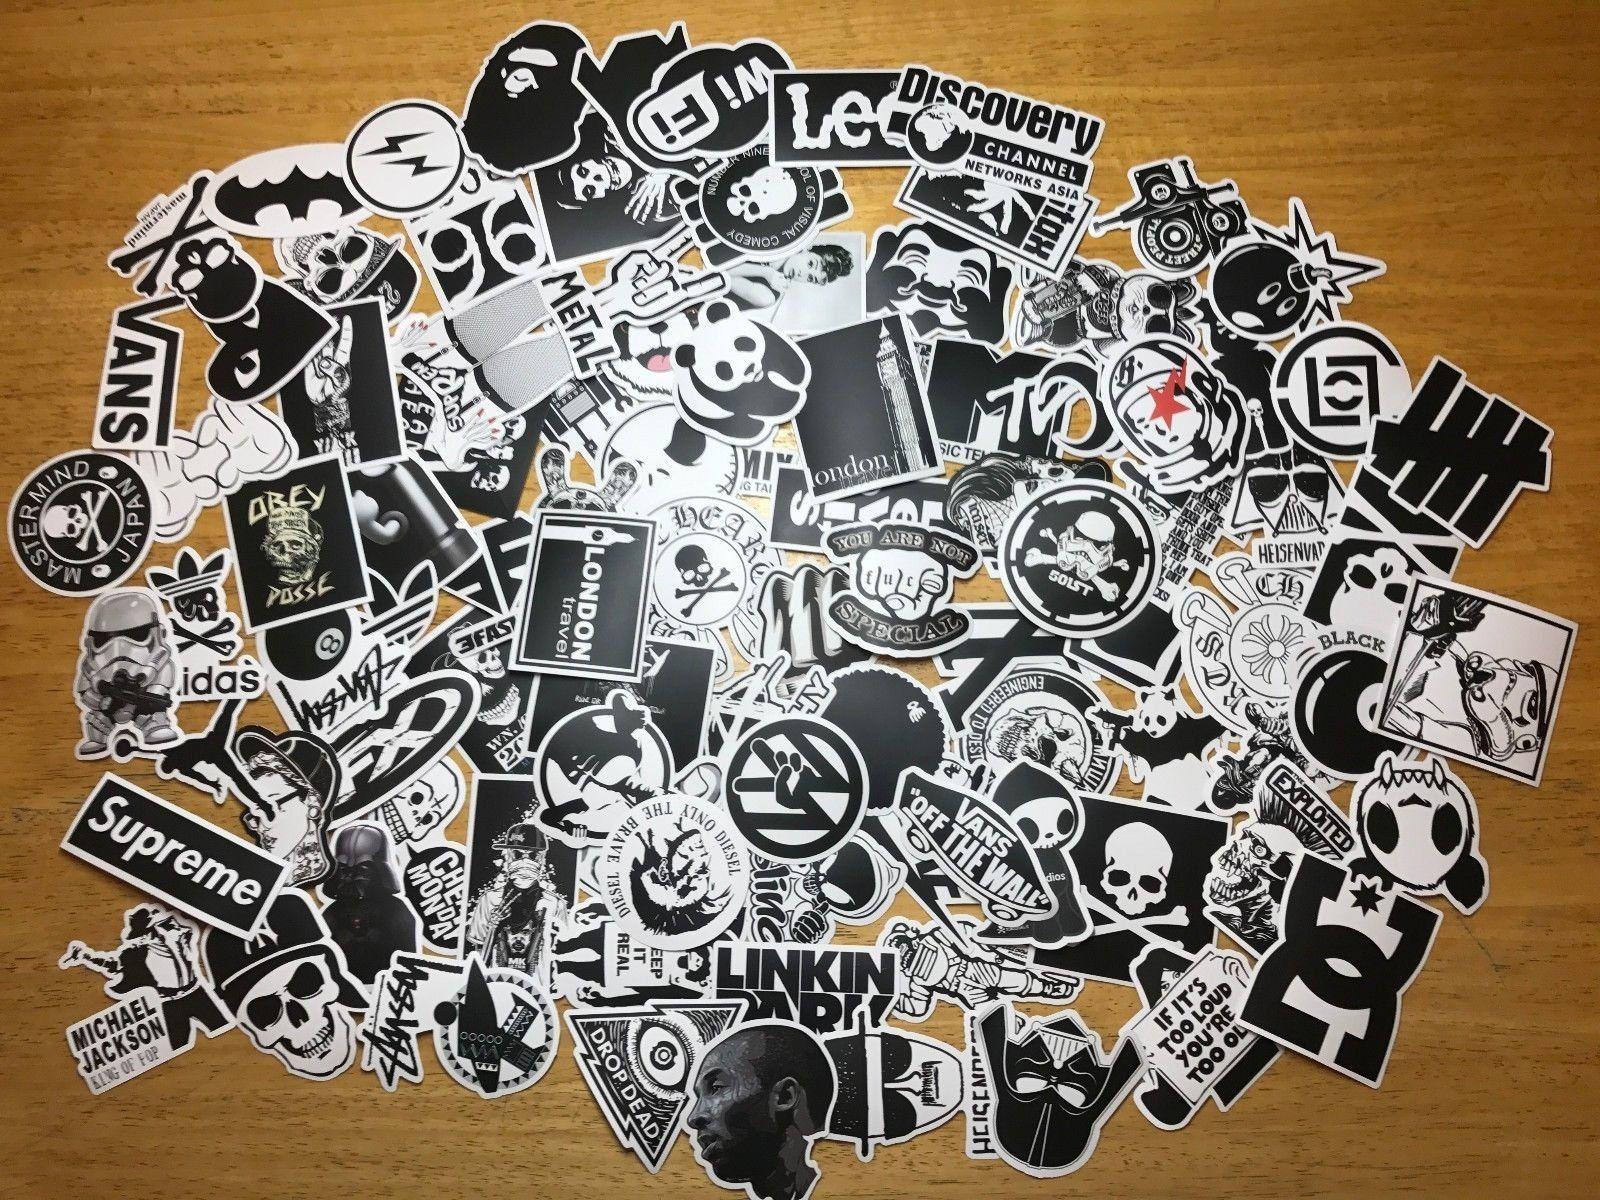 100 Pcs Sticker Pack Supreme Laptop Vinyl Stickers Car Cool Sticker Bomb Pack Sticker Bombing Kit Stickerbomb Wrap Cool Stickers Sticker Bomb Stickers Packs [ 1200 x 1600 Pixel ]